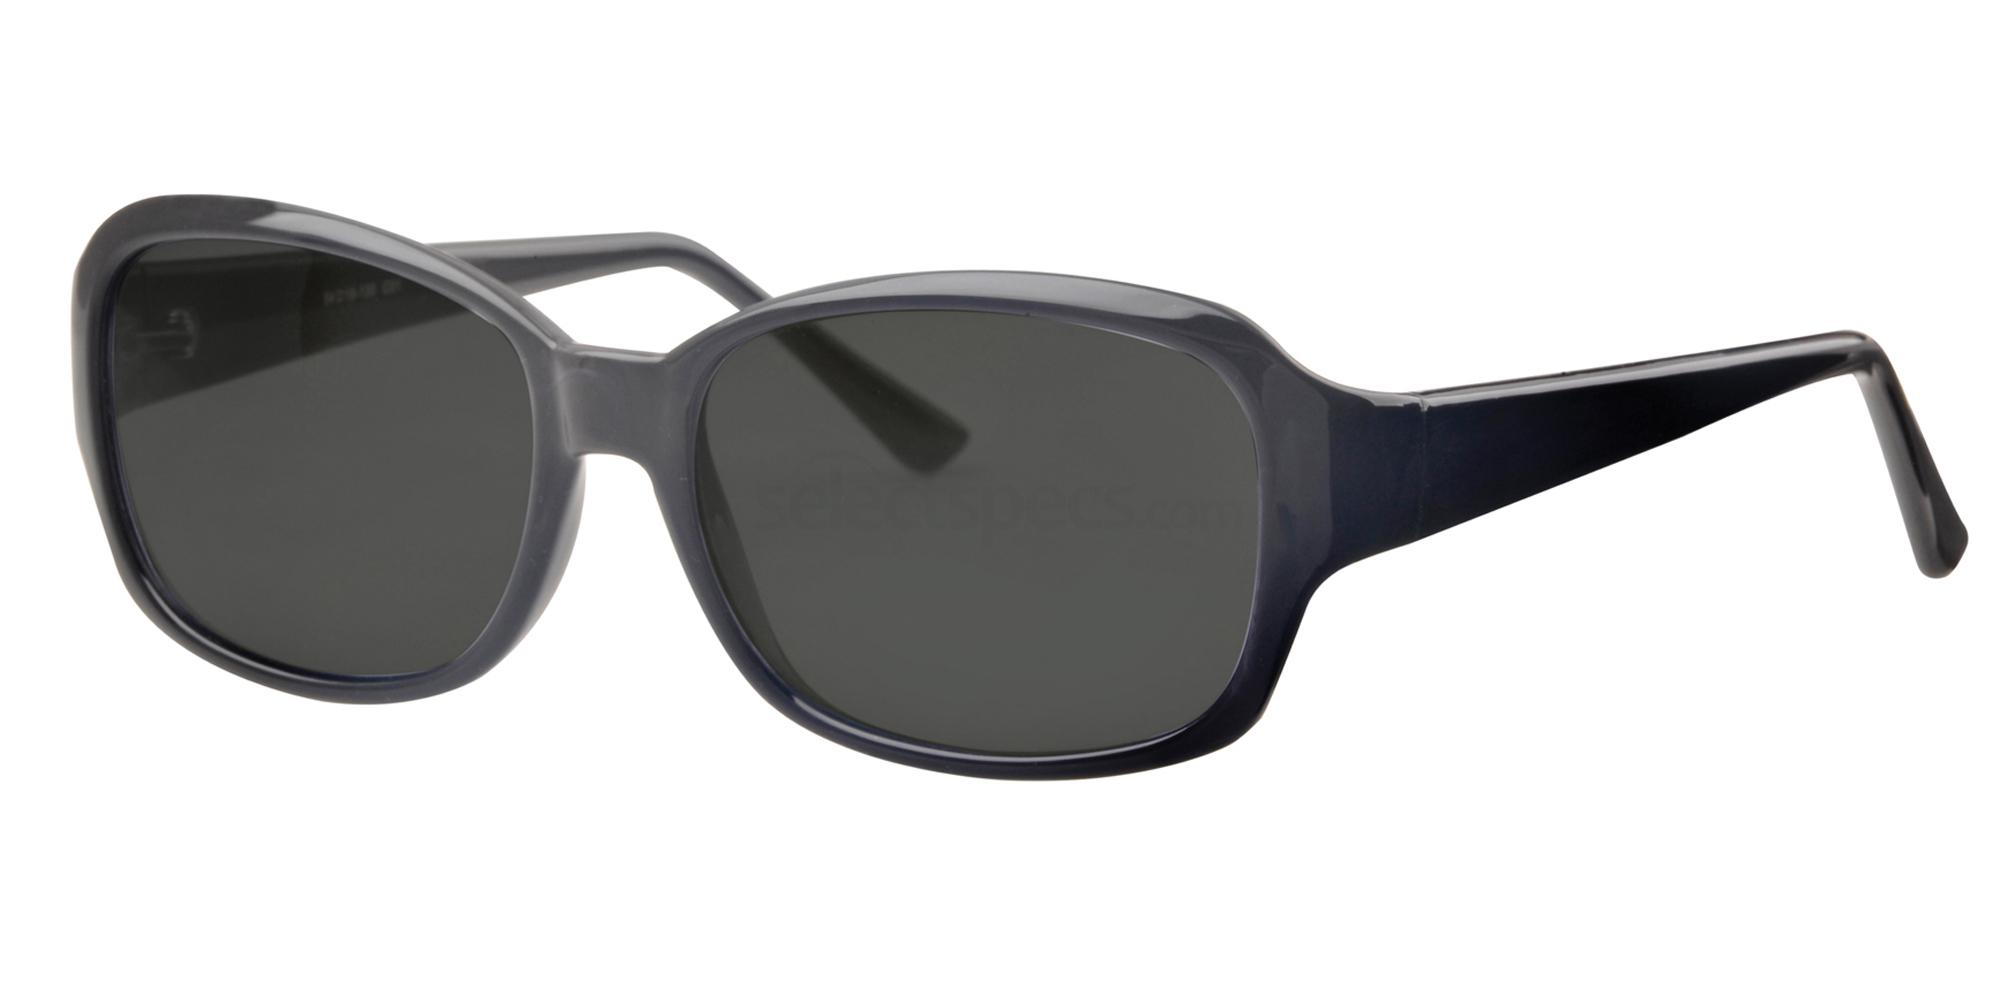 C01 VS178 Sunglasses, Visage